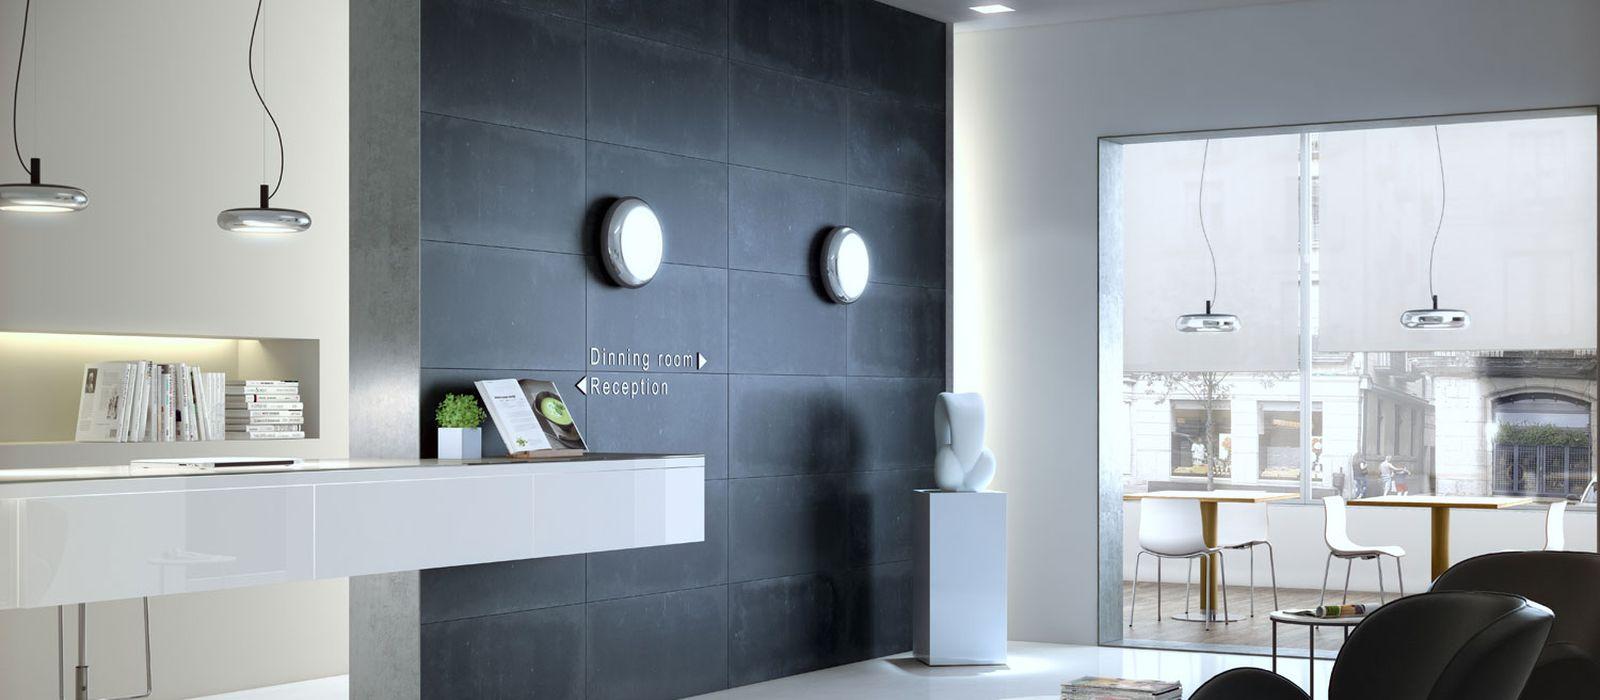 Iluminaci n co co espacios arquitectura de interiores - Iluminacion interior armarios ...